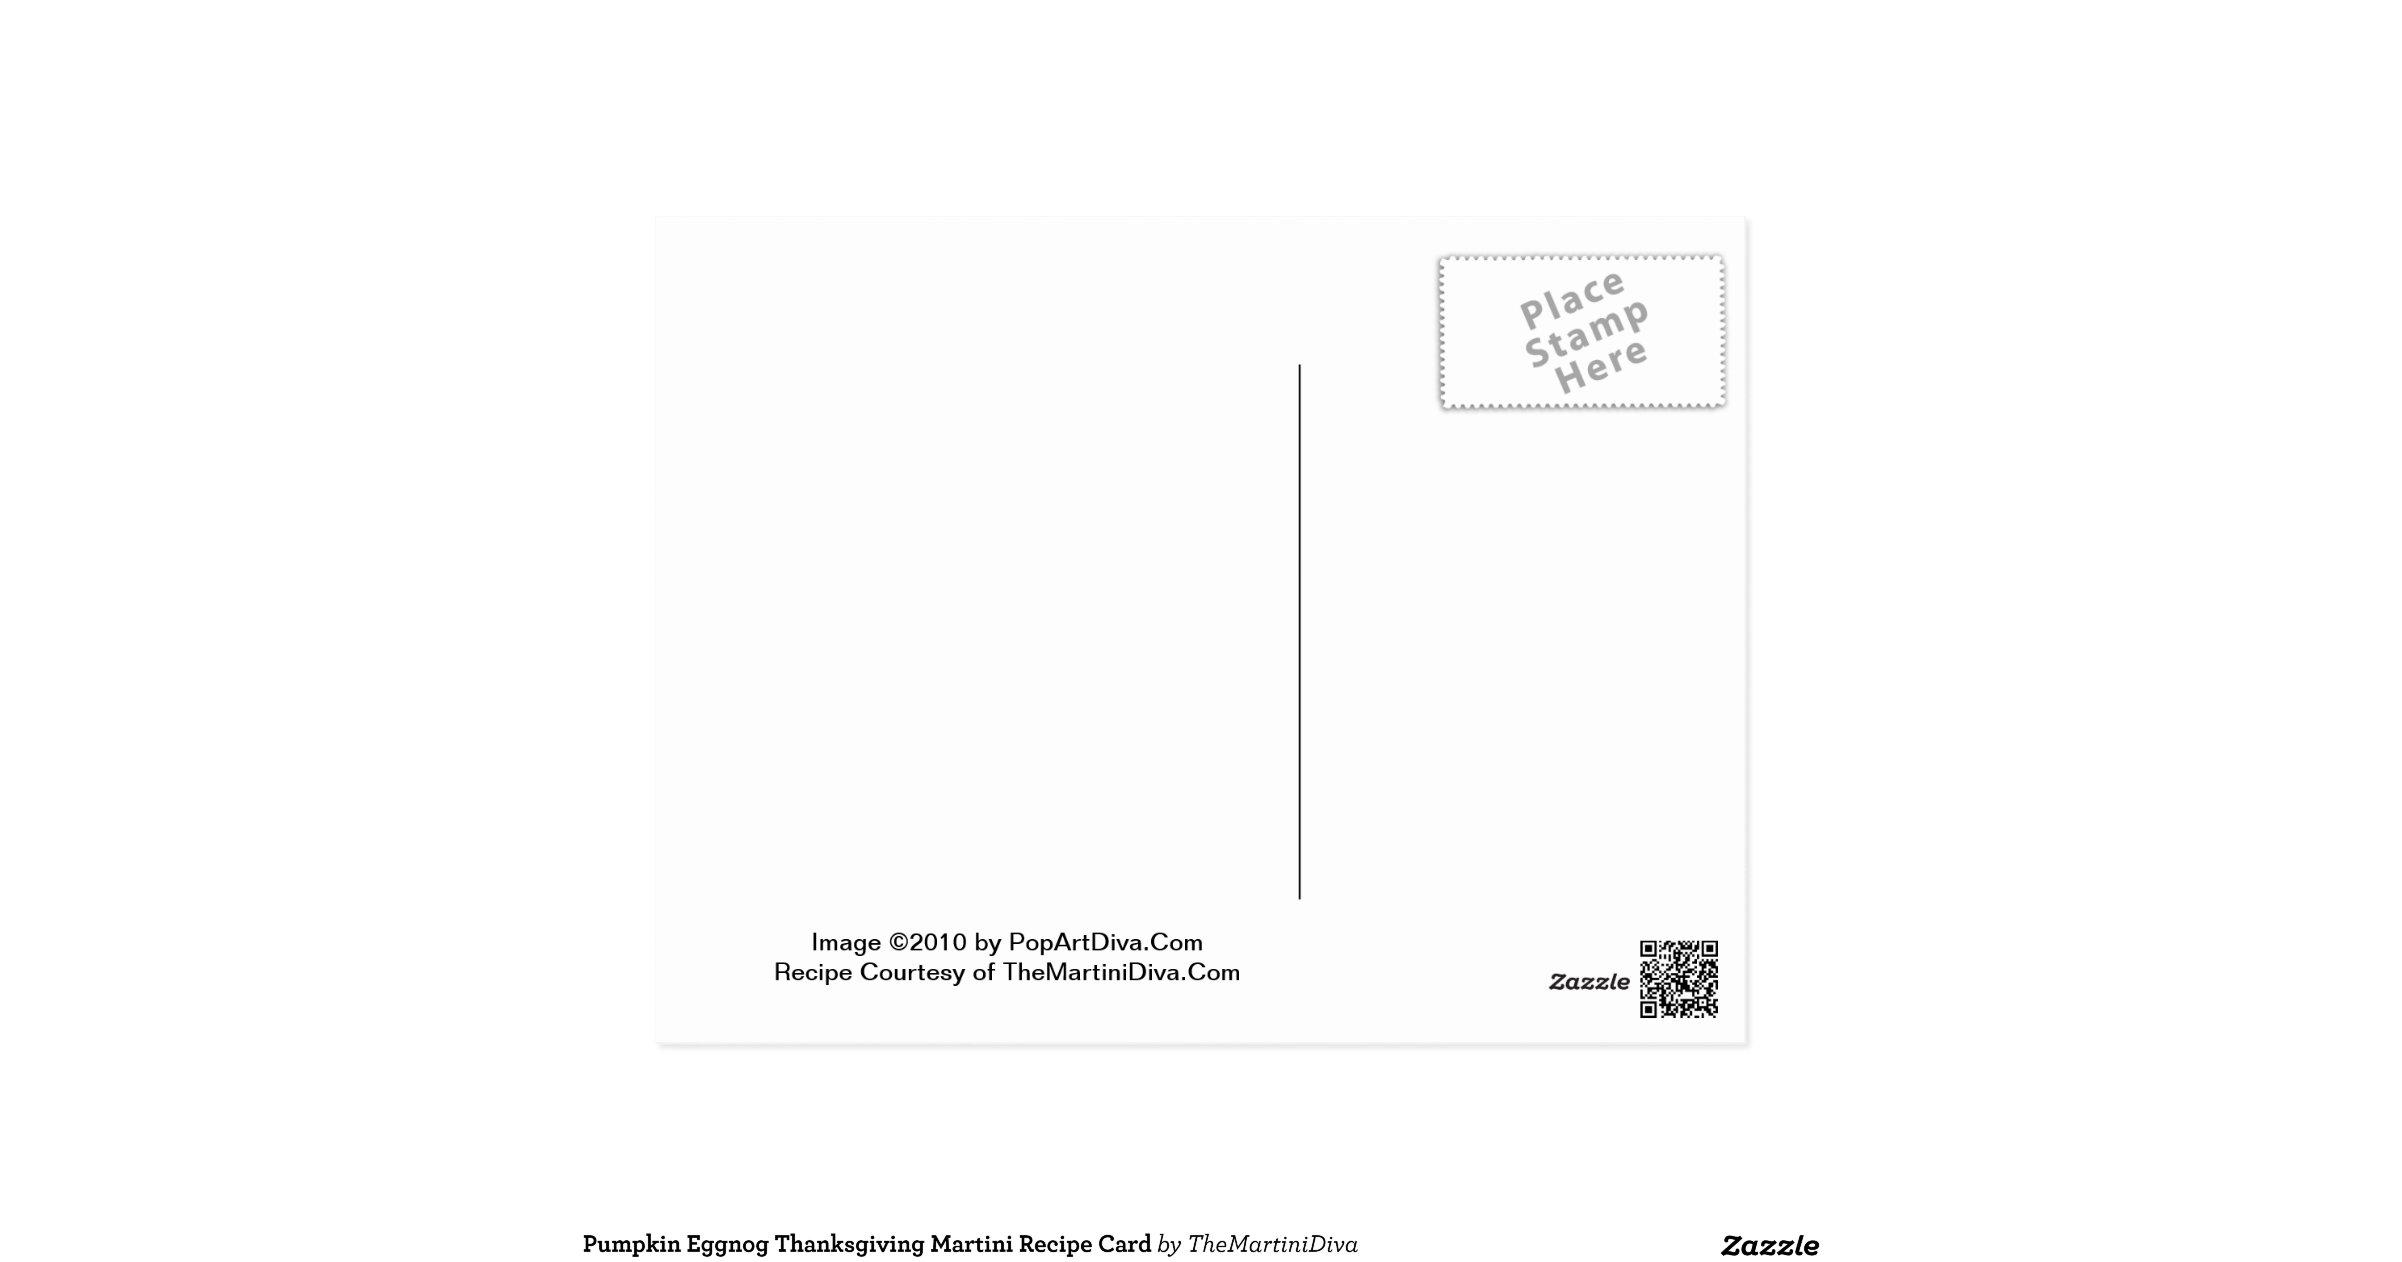 pumpkin_eggnog_thanksgiving_martini_recipe_card_postcard ...